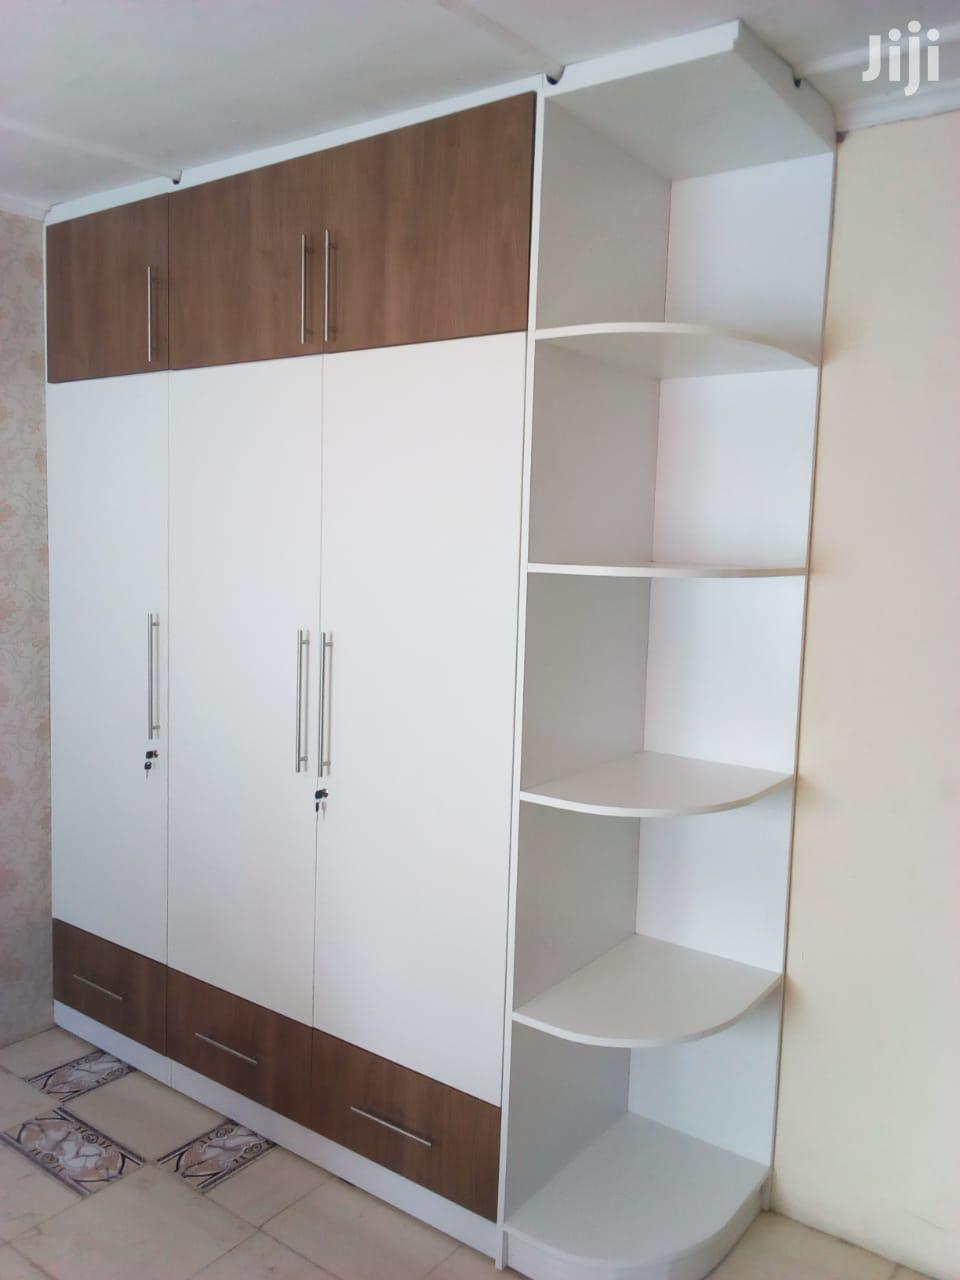 Wardrobes Design Wth Corner Shelves